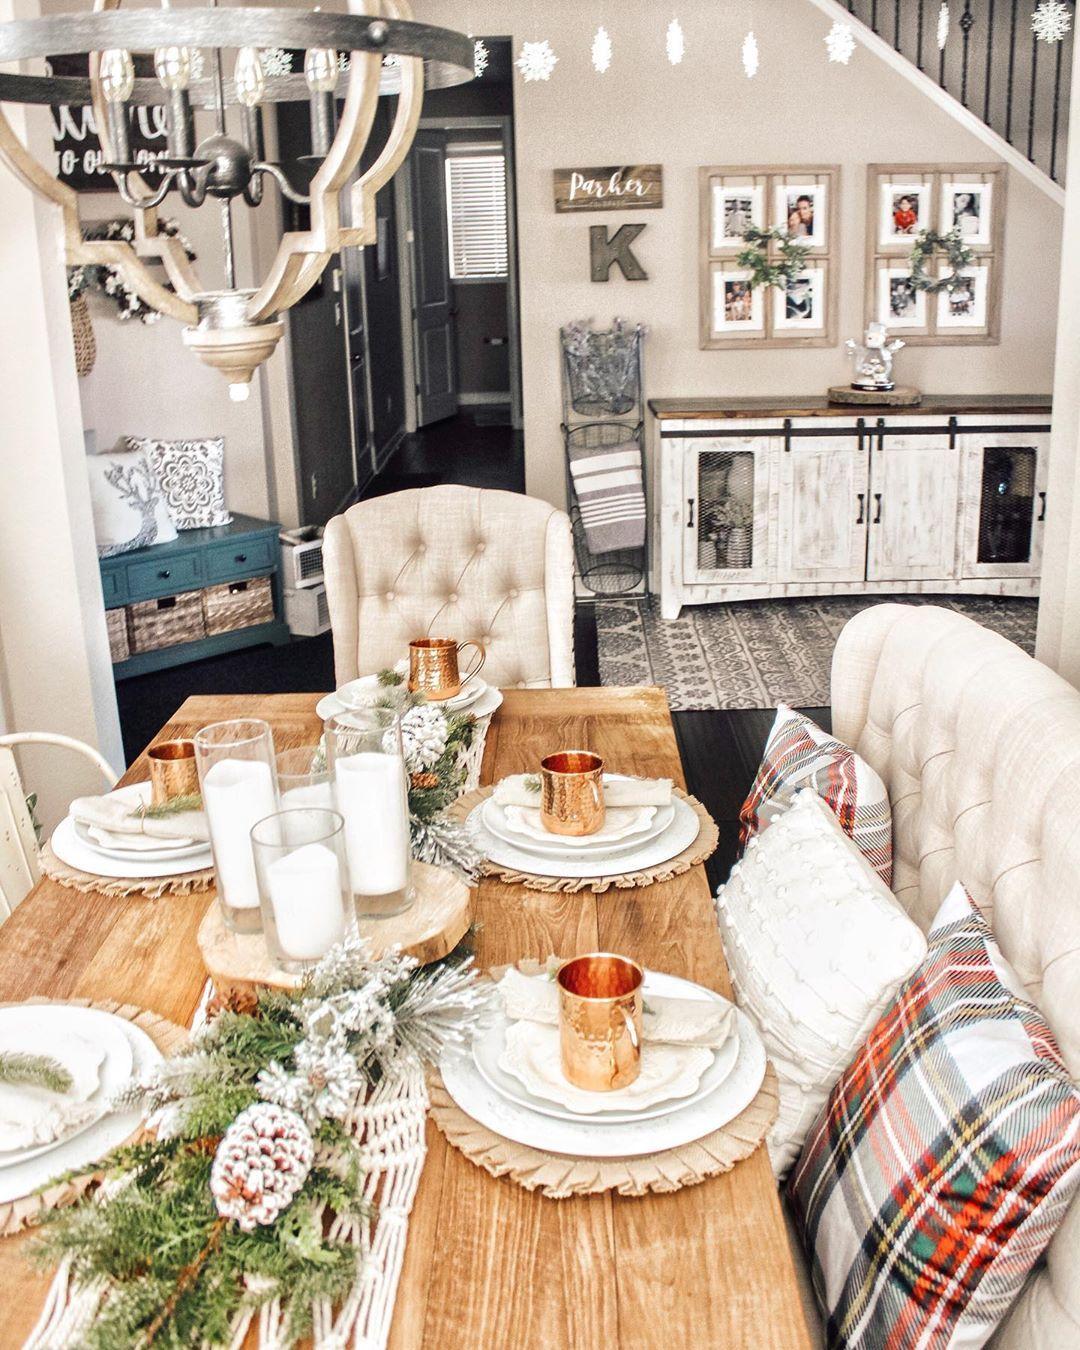 Home Design Ideas Instagram:  Home Decor & Farmhouse On Instagram : Happy Monday! We